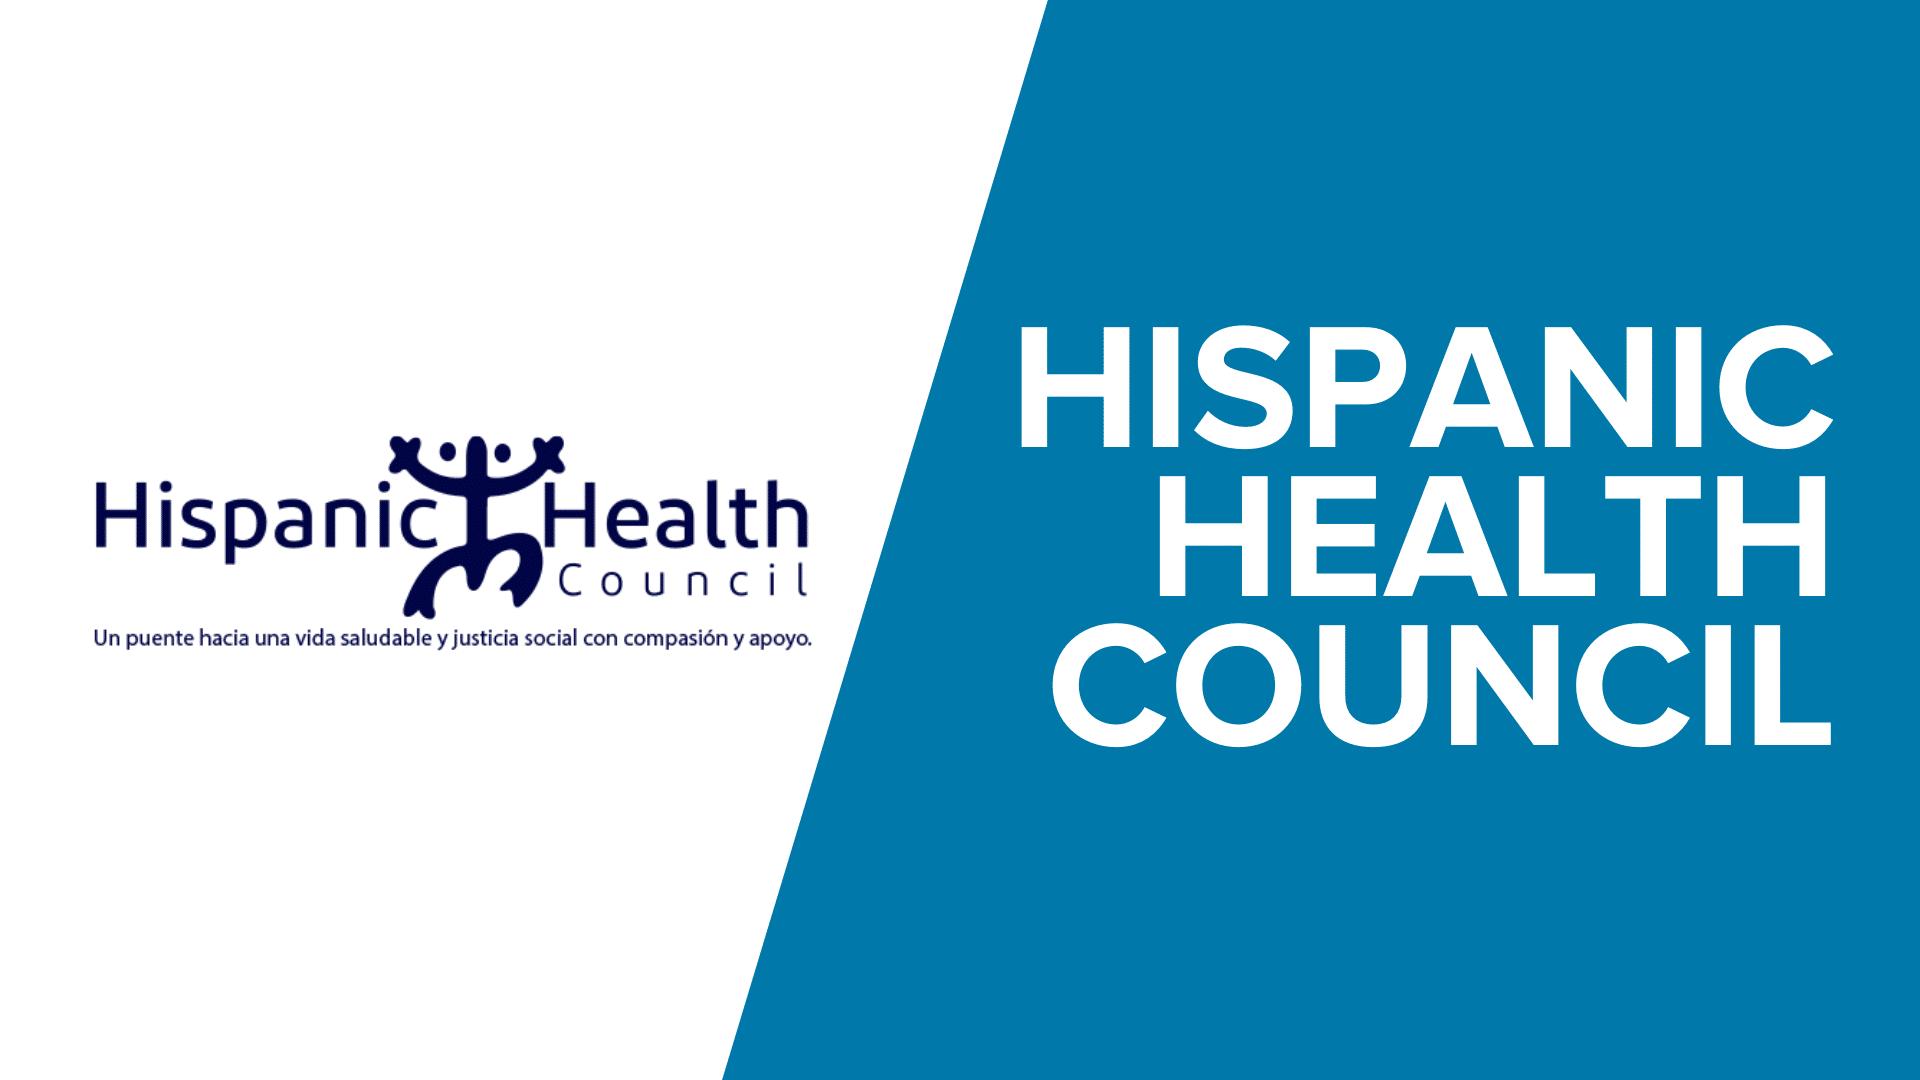 Hispanic Health Council